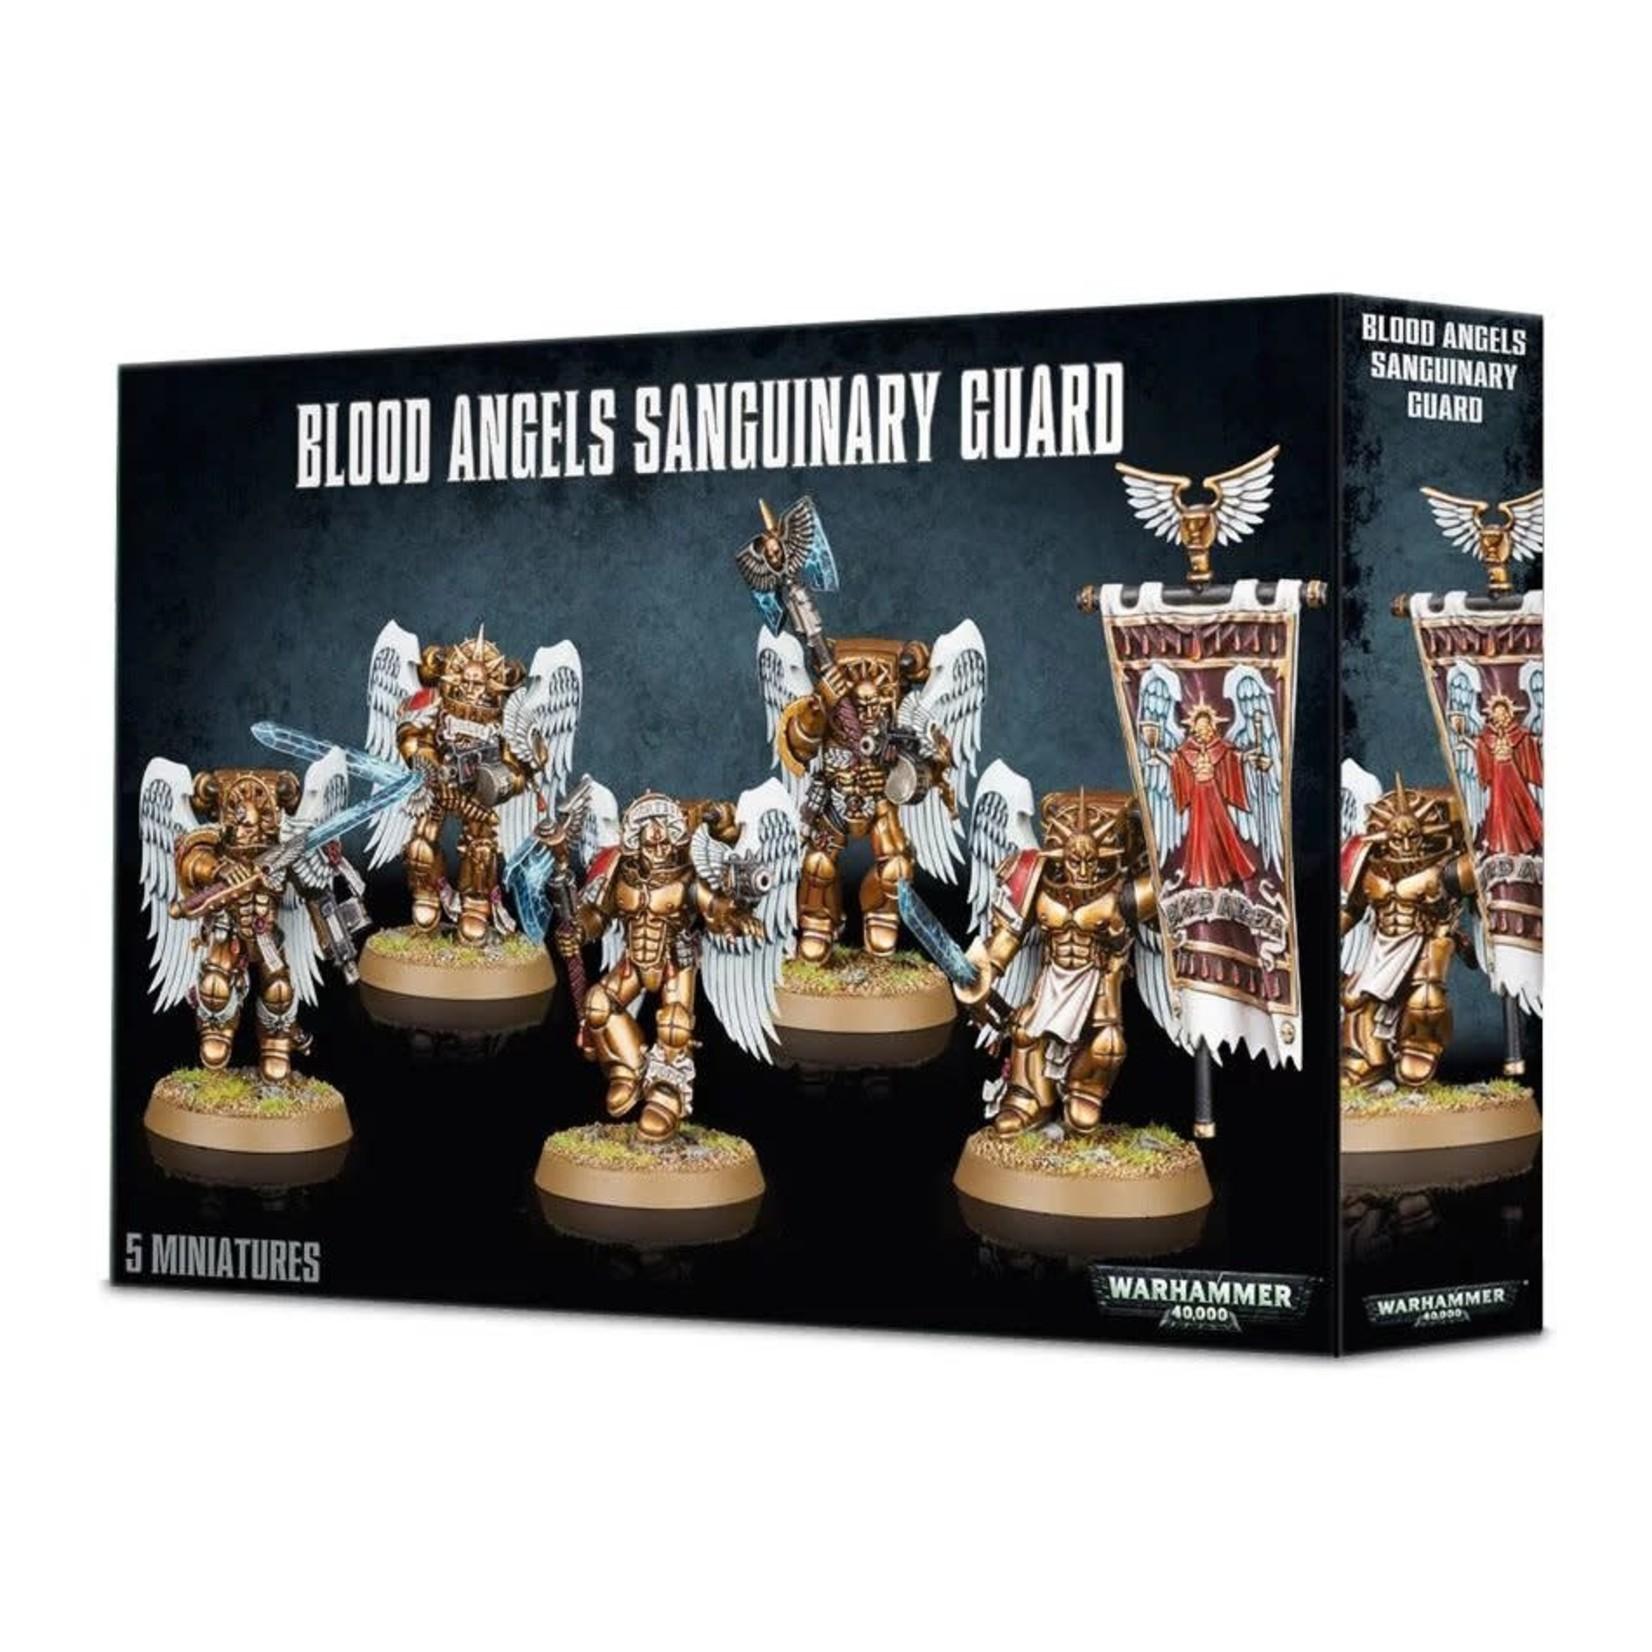 Games Workshop Warhammer 40k: Space Marine - Blood Angels Sanguinary Guard